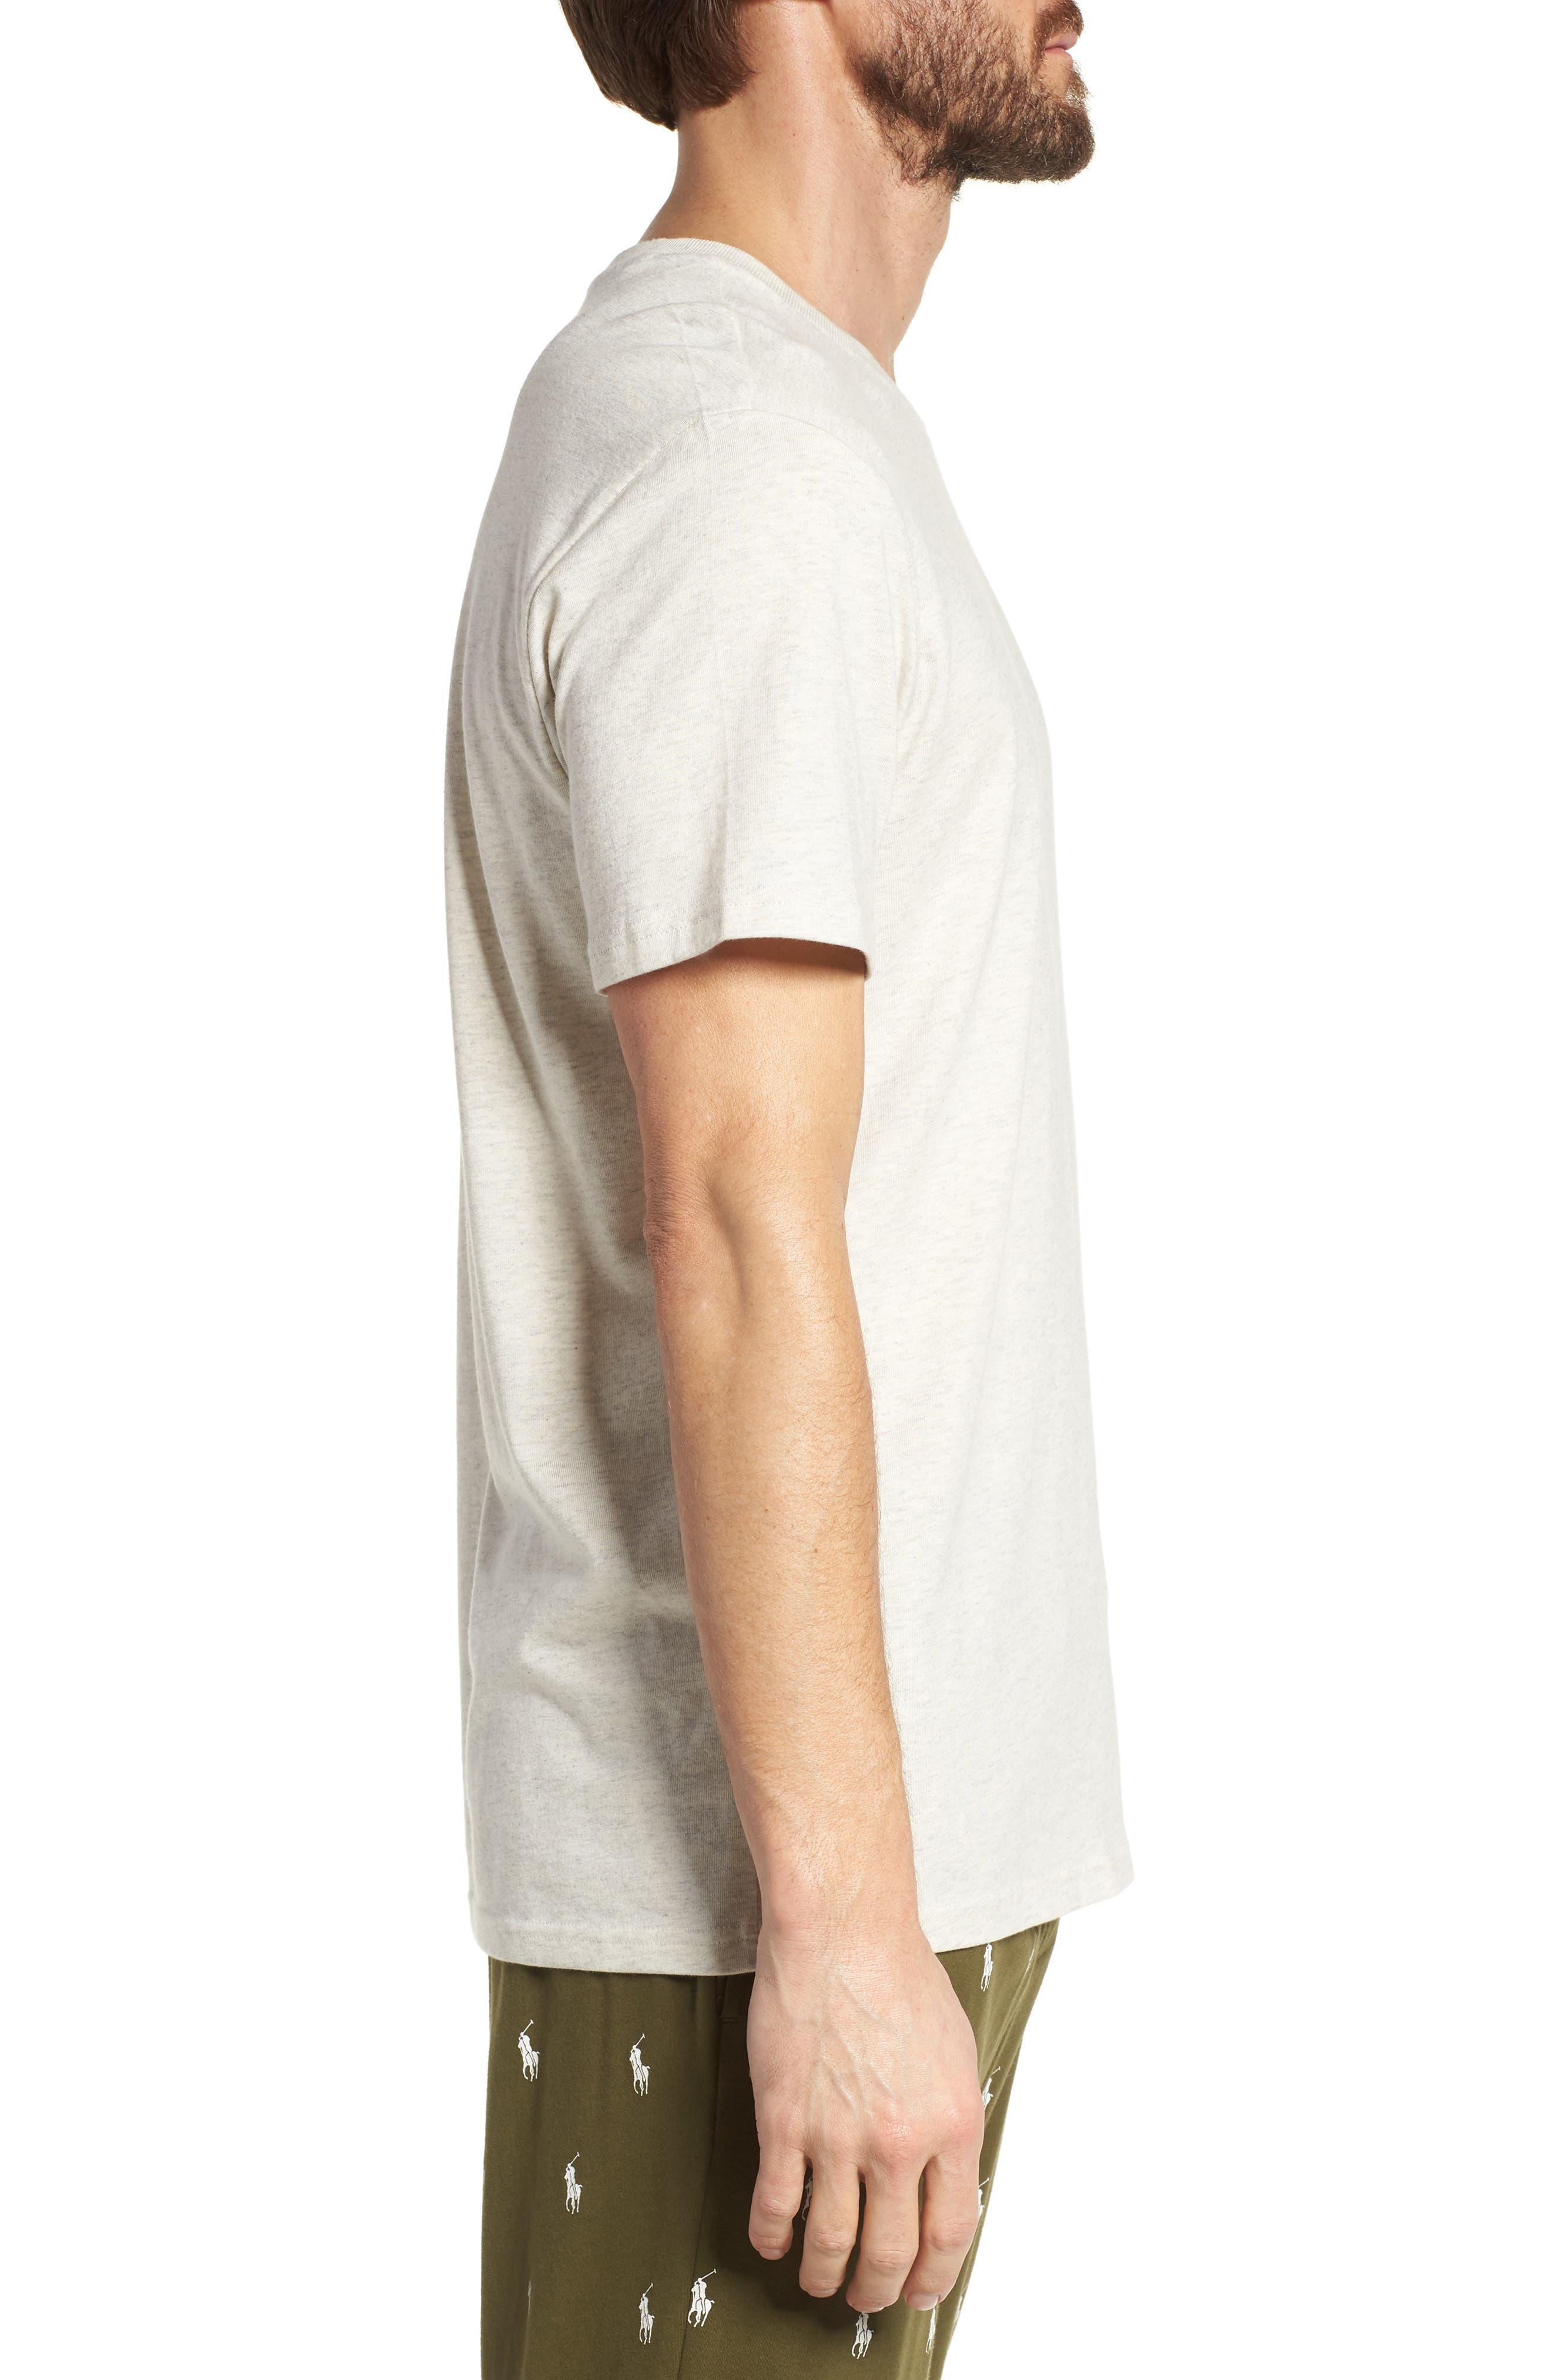 Supreme Comfort Crewneck T-Shirt,                             Alternate thumbnail 3, color,                             Sand Heather/ Bright Navy